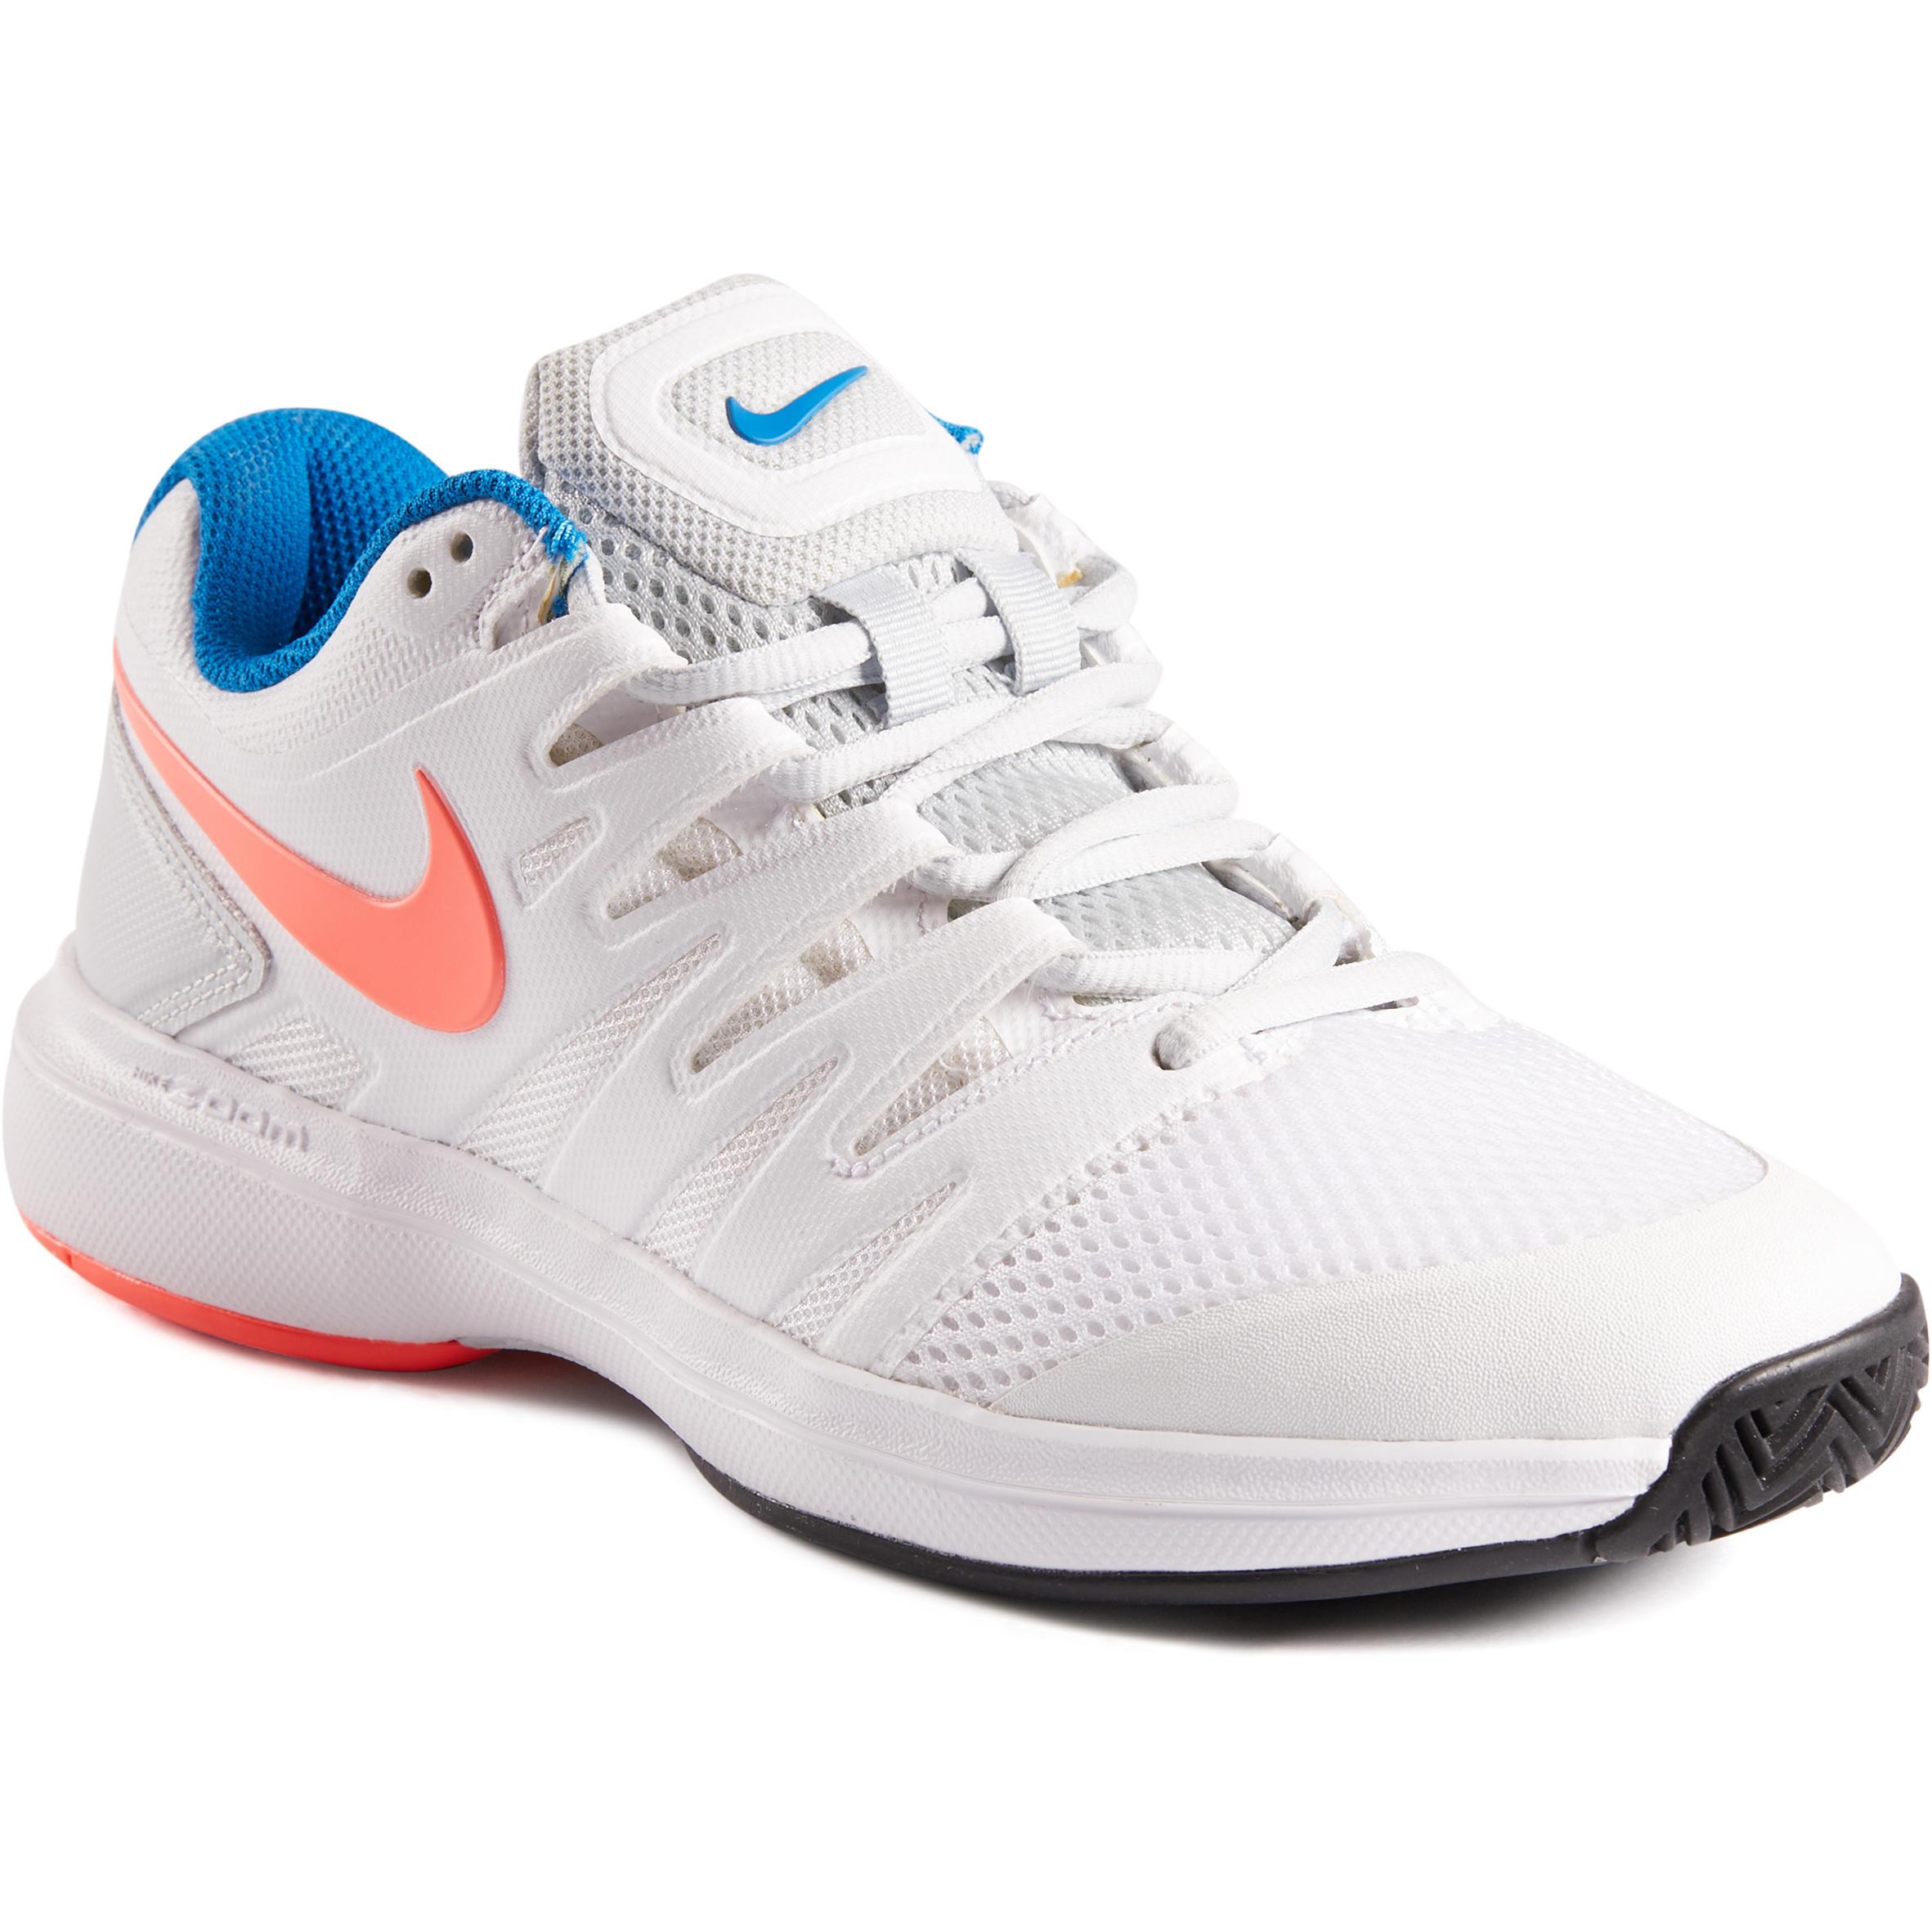 Chaussures de tennis femme zoom prestige blanche rose nike